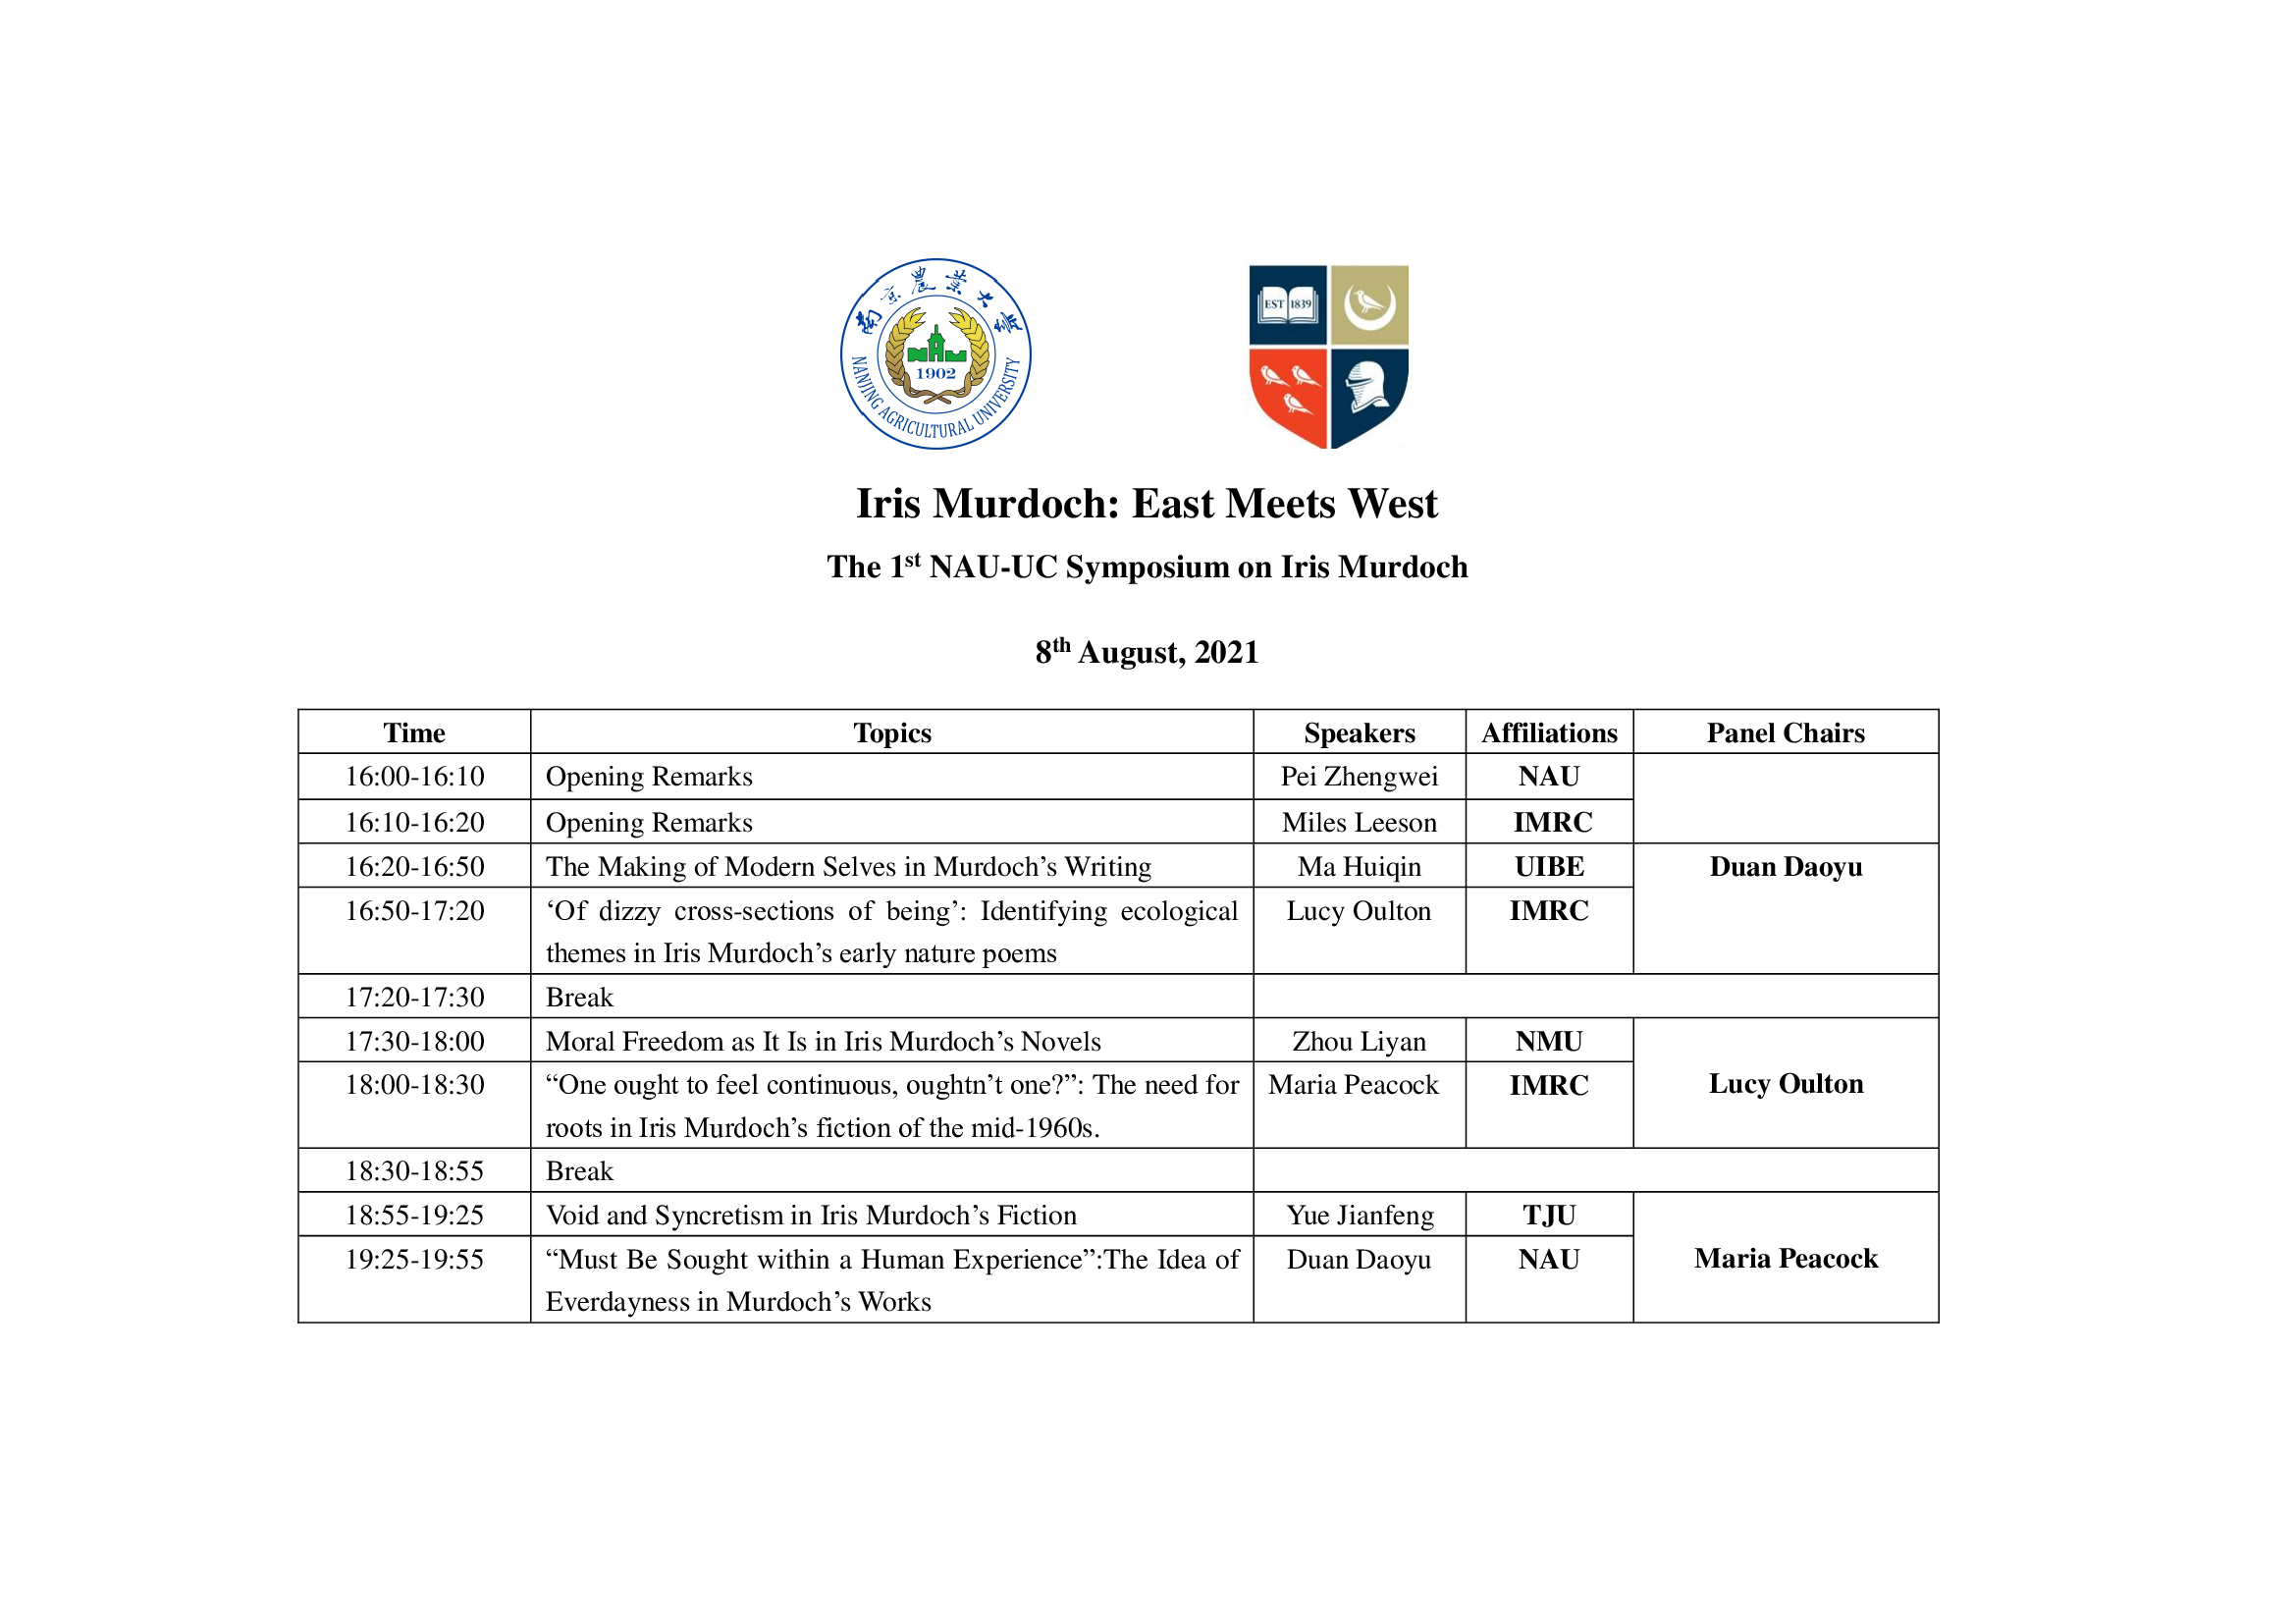 Iris Murdoch: East Meets West schedule